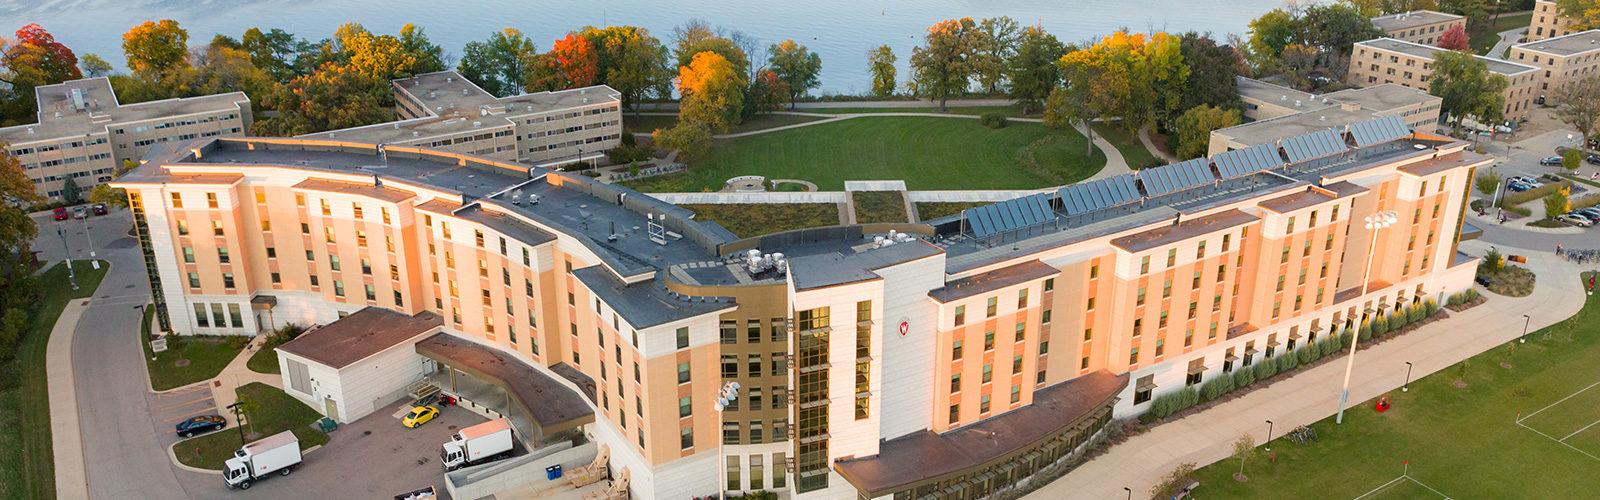 Billing & Rates – University Housing – UW–Madison